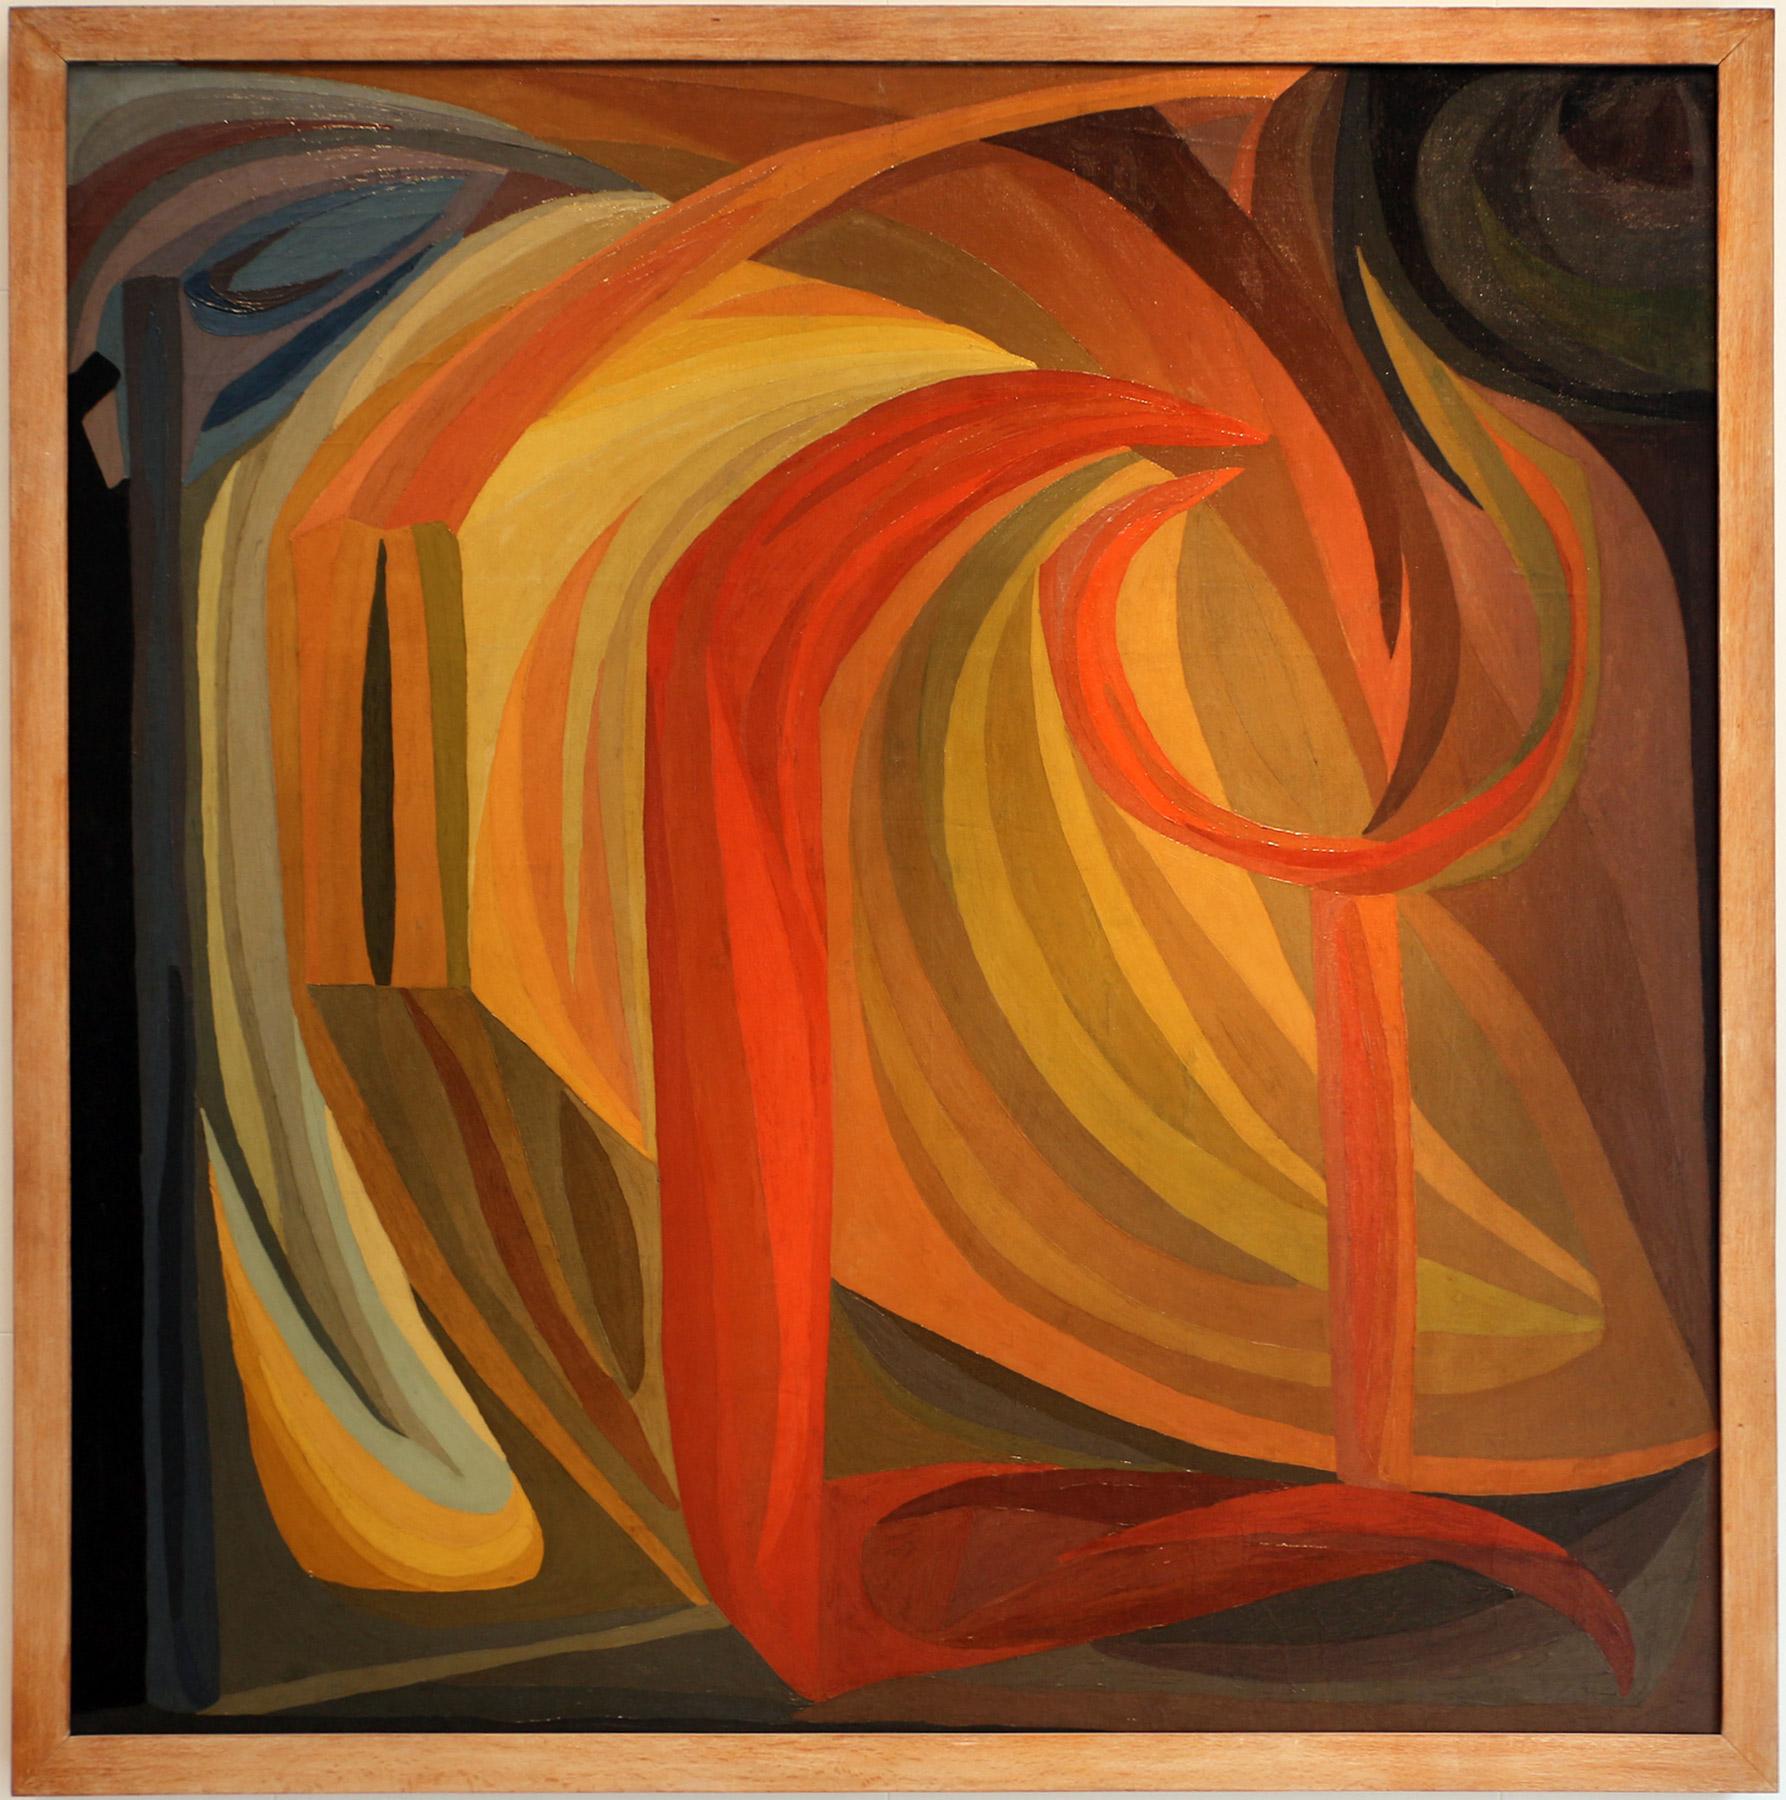 Otto Freundlich, Composizione (1911; olio su tela, 200 x 200 cm; Parigi, Musée d'Art Moderne de la Ville)